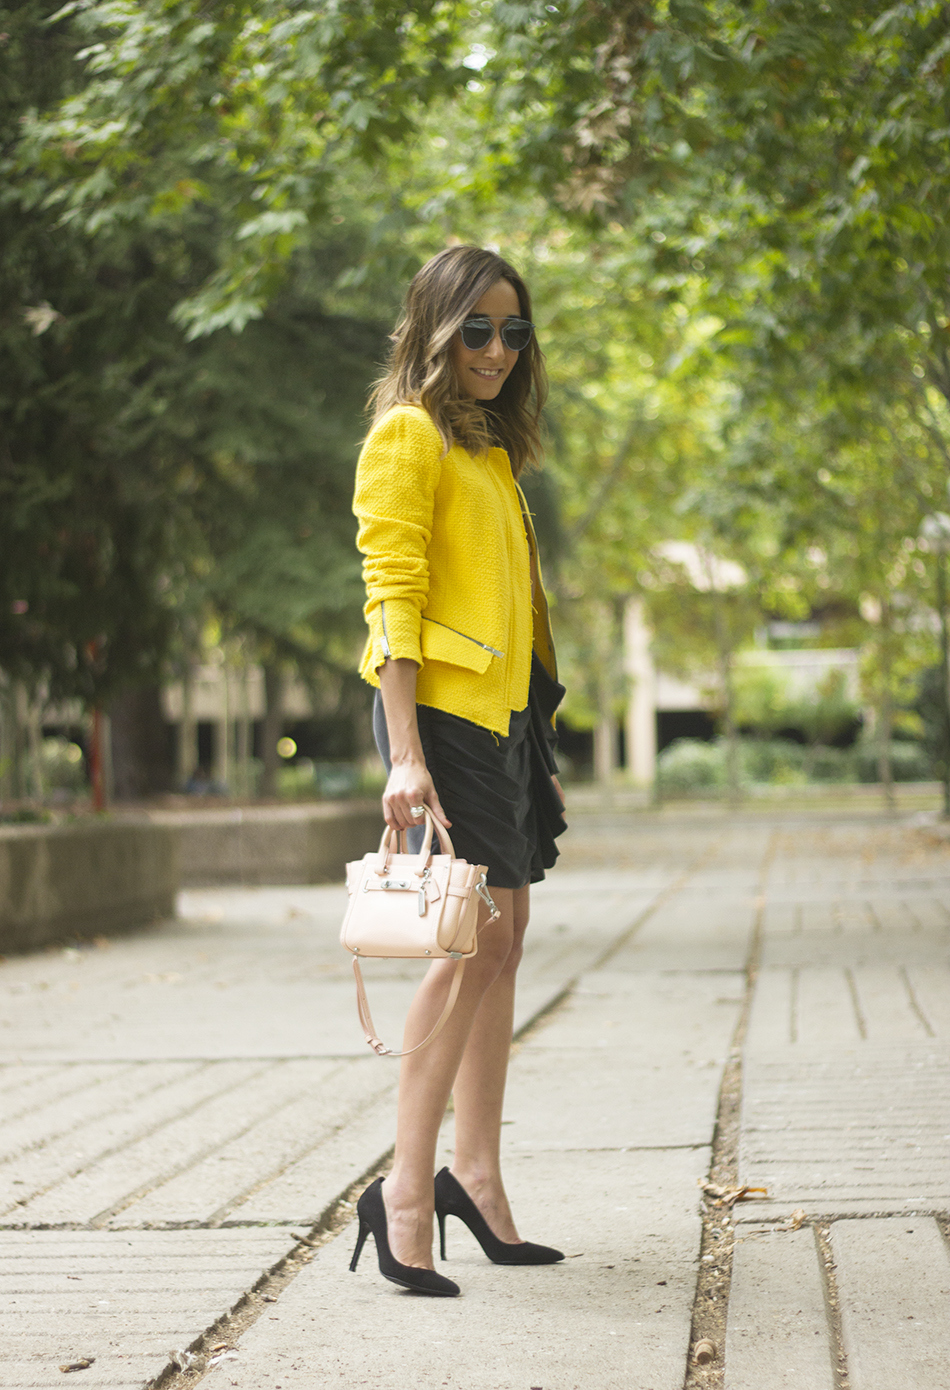 Yellow Jacket Draped Grey Skirt Outfit05